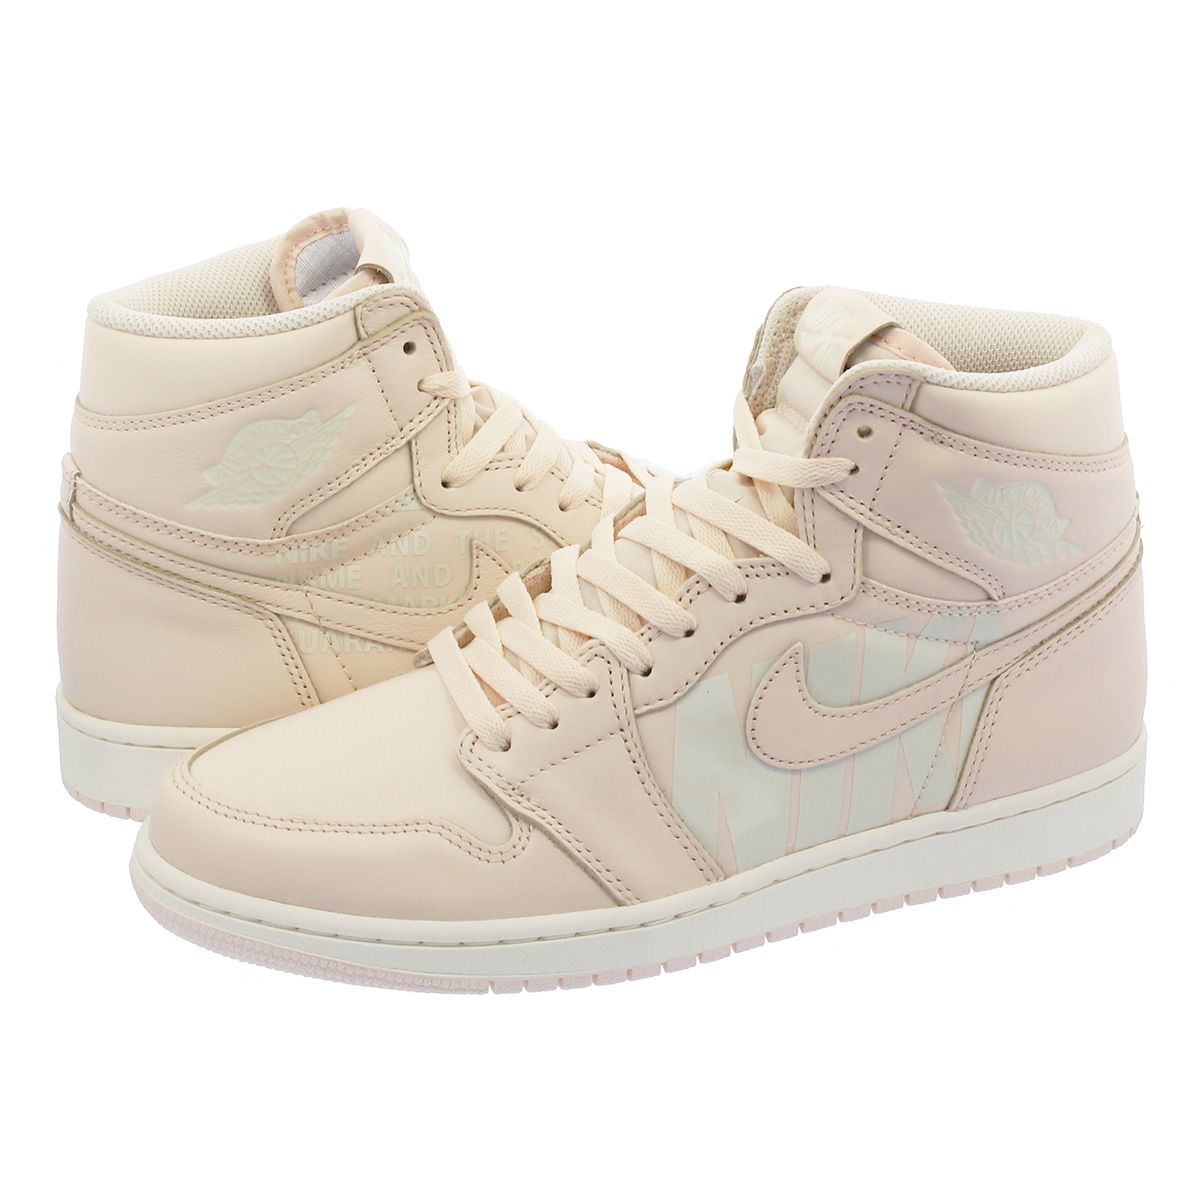 NIKE AIR JORDAN 1 RETRO HIGH OG Nike Air Jordan 1 nostalgic high OG GUAVA  ICE SAIL 555 c6fcdfad2